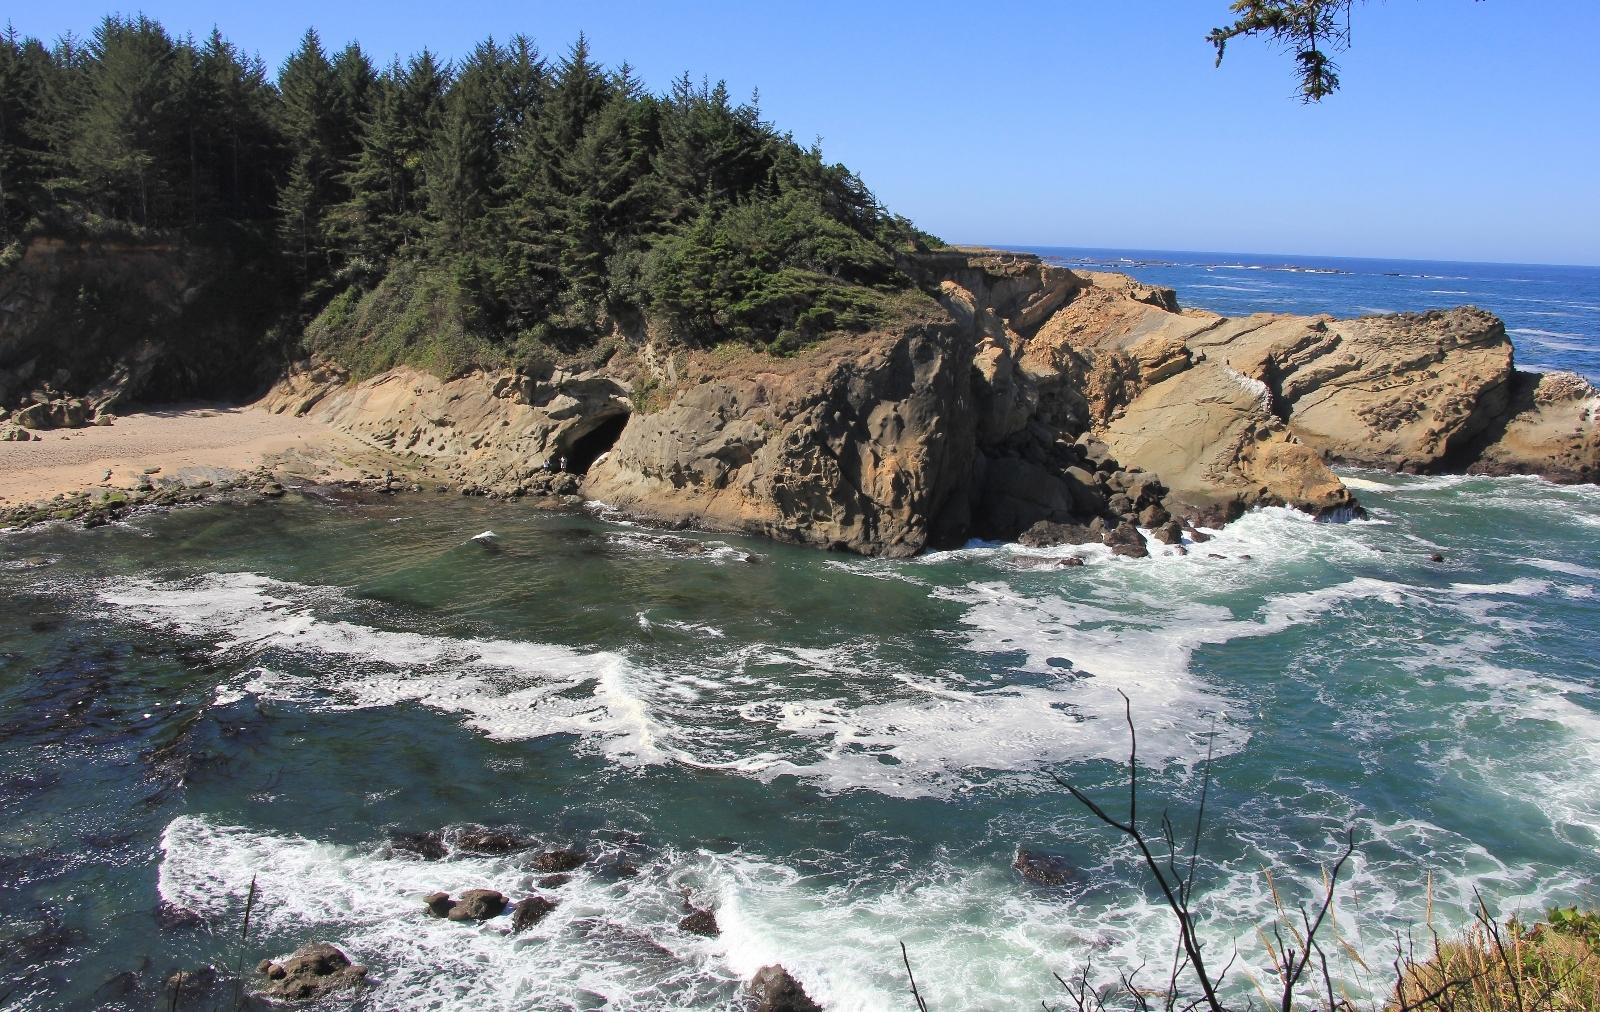 09-04-16-oregon-coast-shore-acres-111